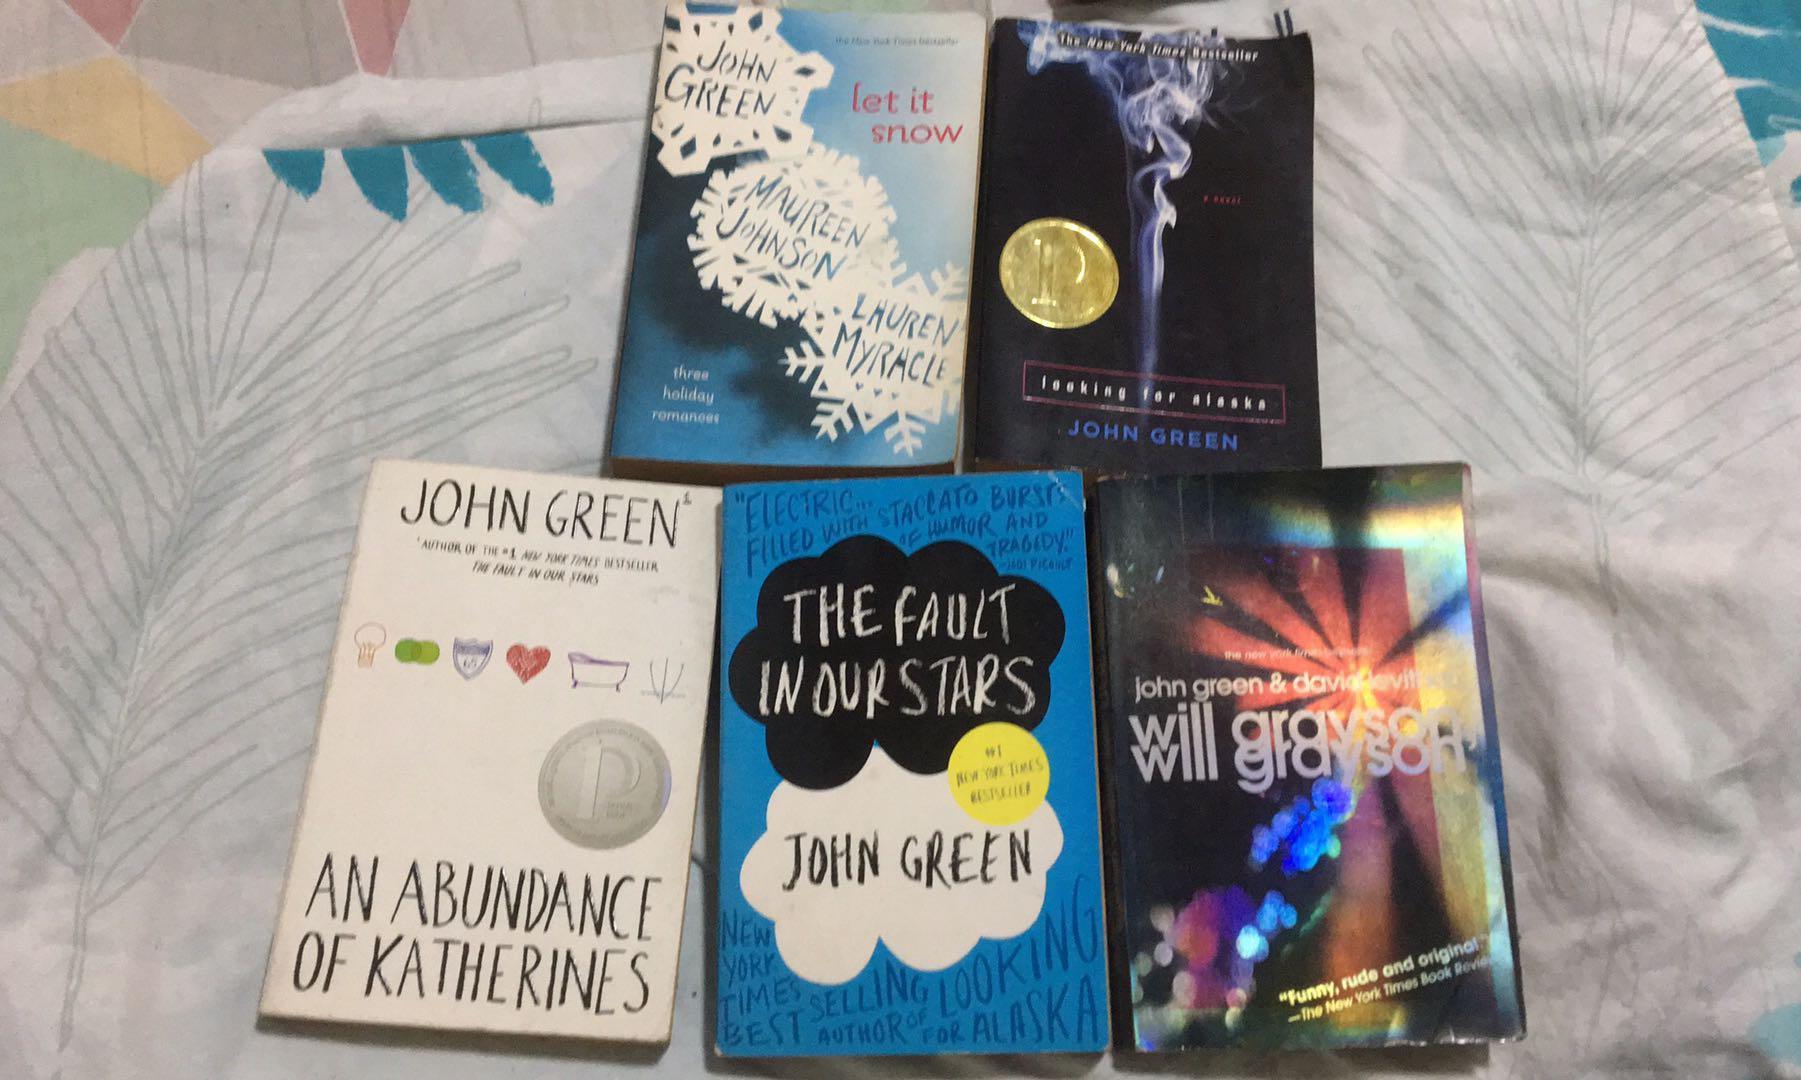 John Green Books (All 5)